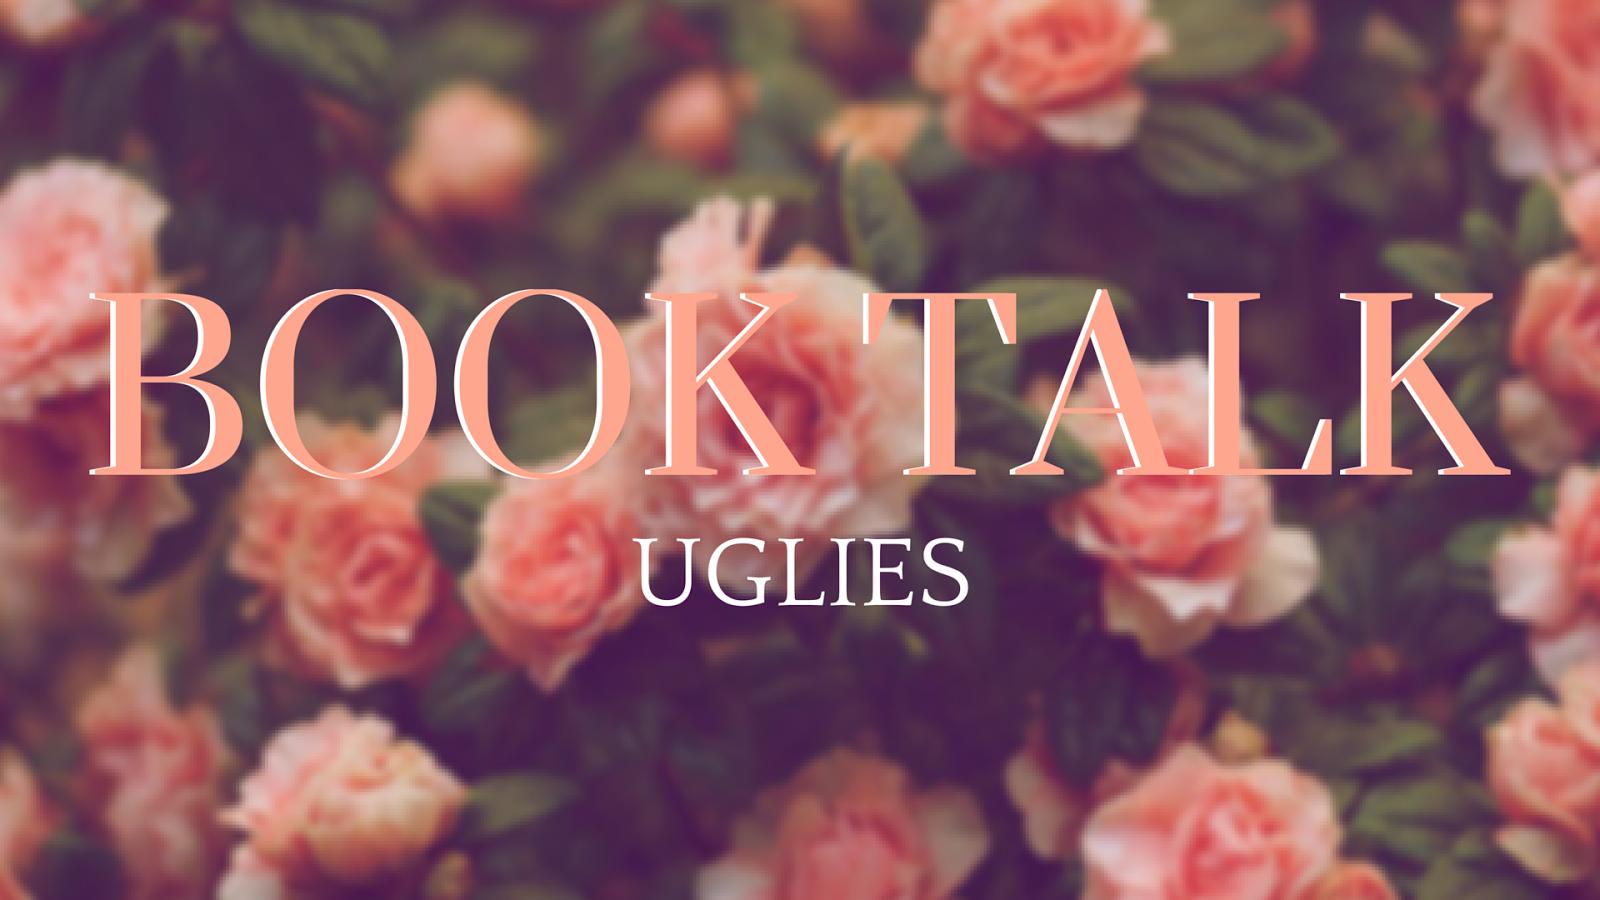 Book Talk | Uglies - The Nameless Book Blog